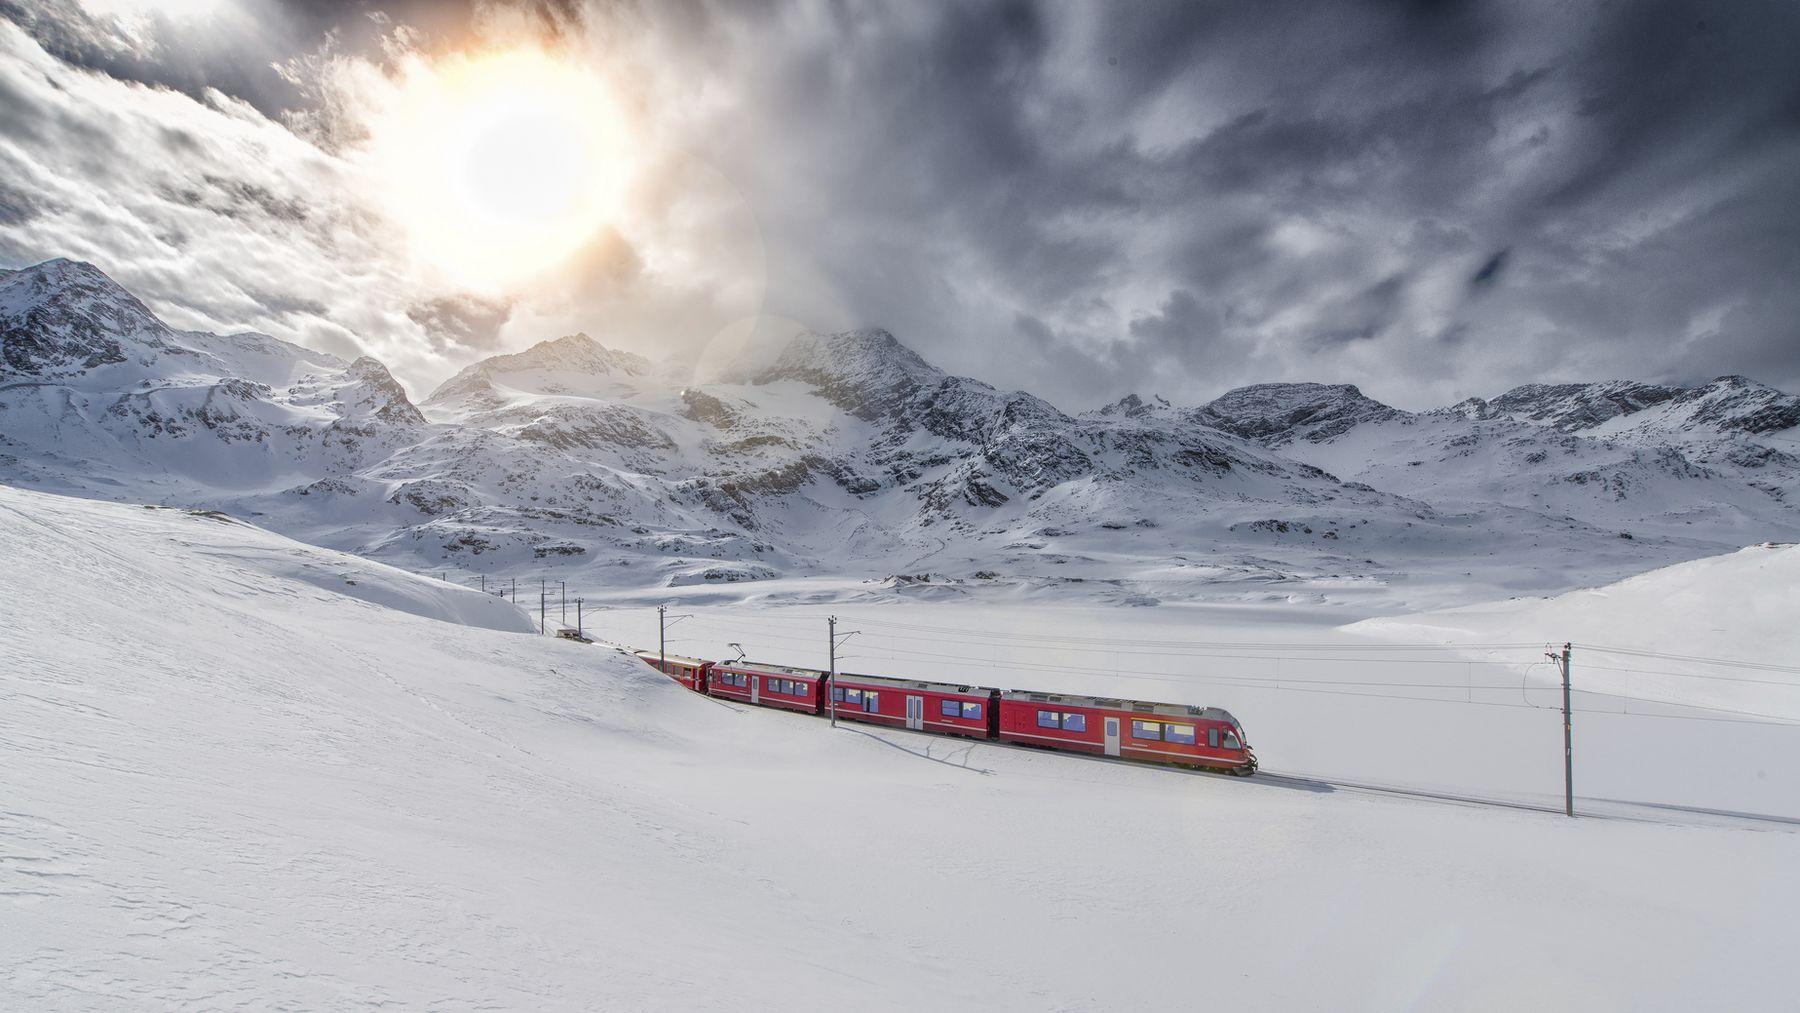 Schweizer Berg Zug Bernina Express uberkreuzten durch die